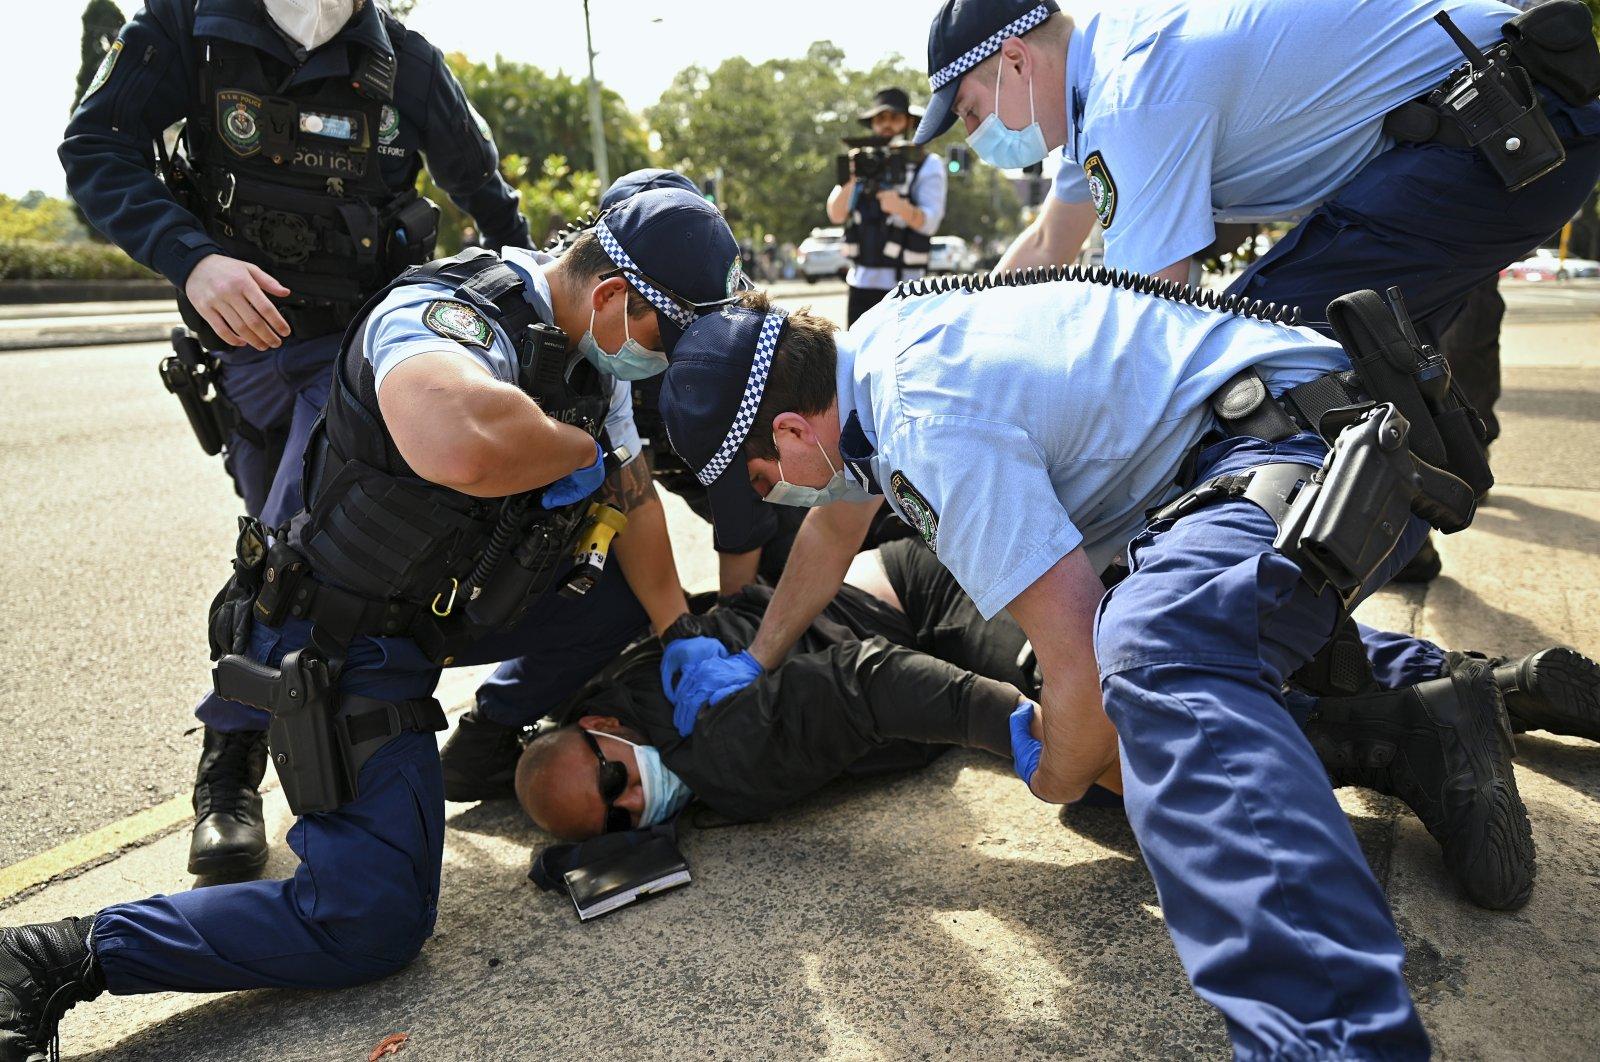 Police arrest a man during an anti-lockdown protest in Sydney, Australia, Saturday, Aug. 21, 2021. (Steven Saphore/AAP Image via AP)